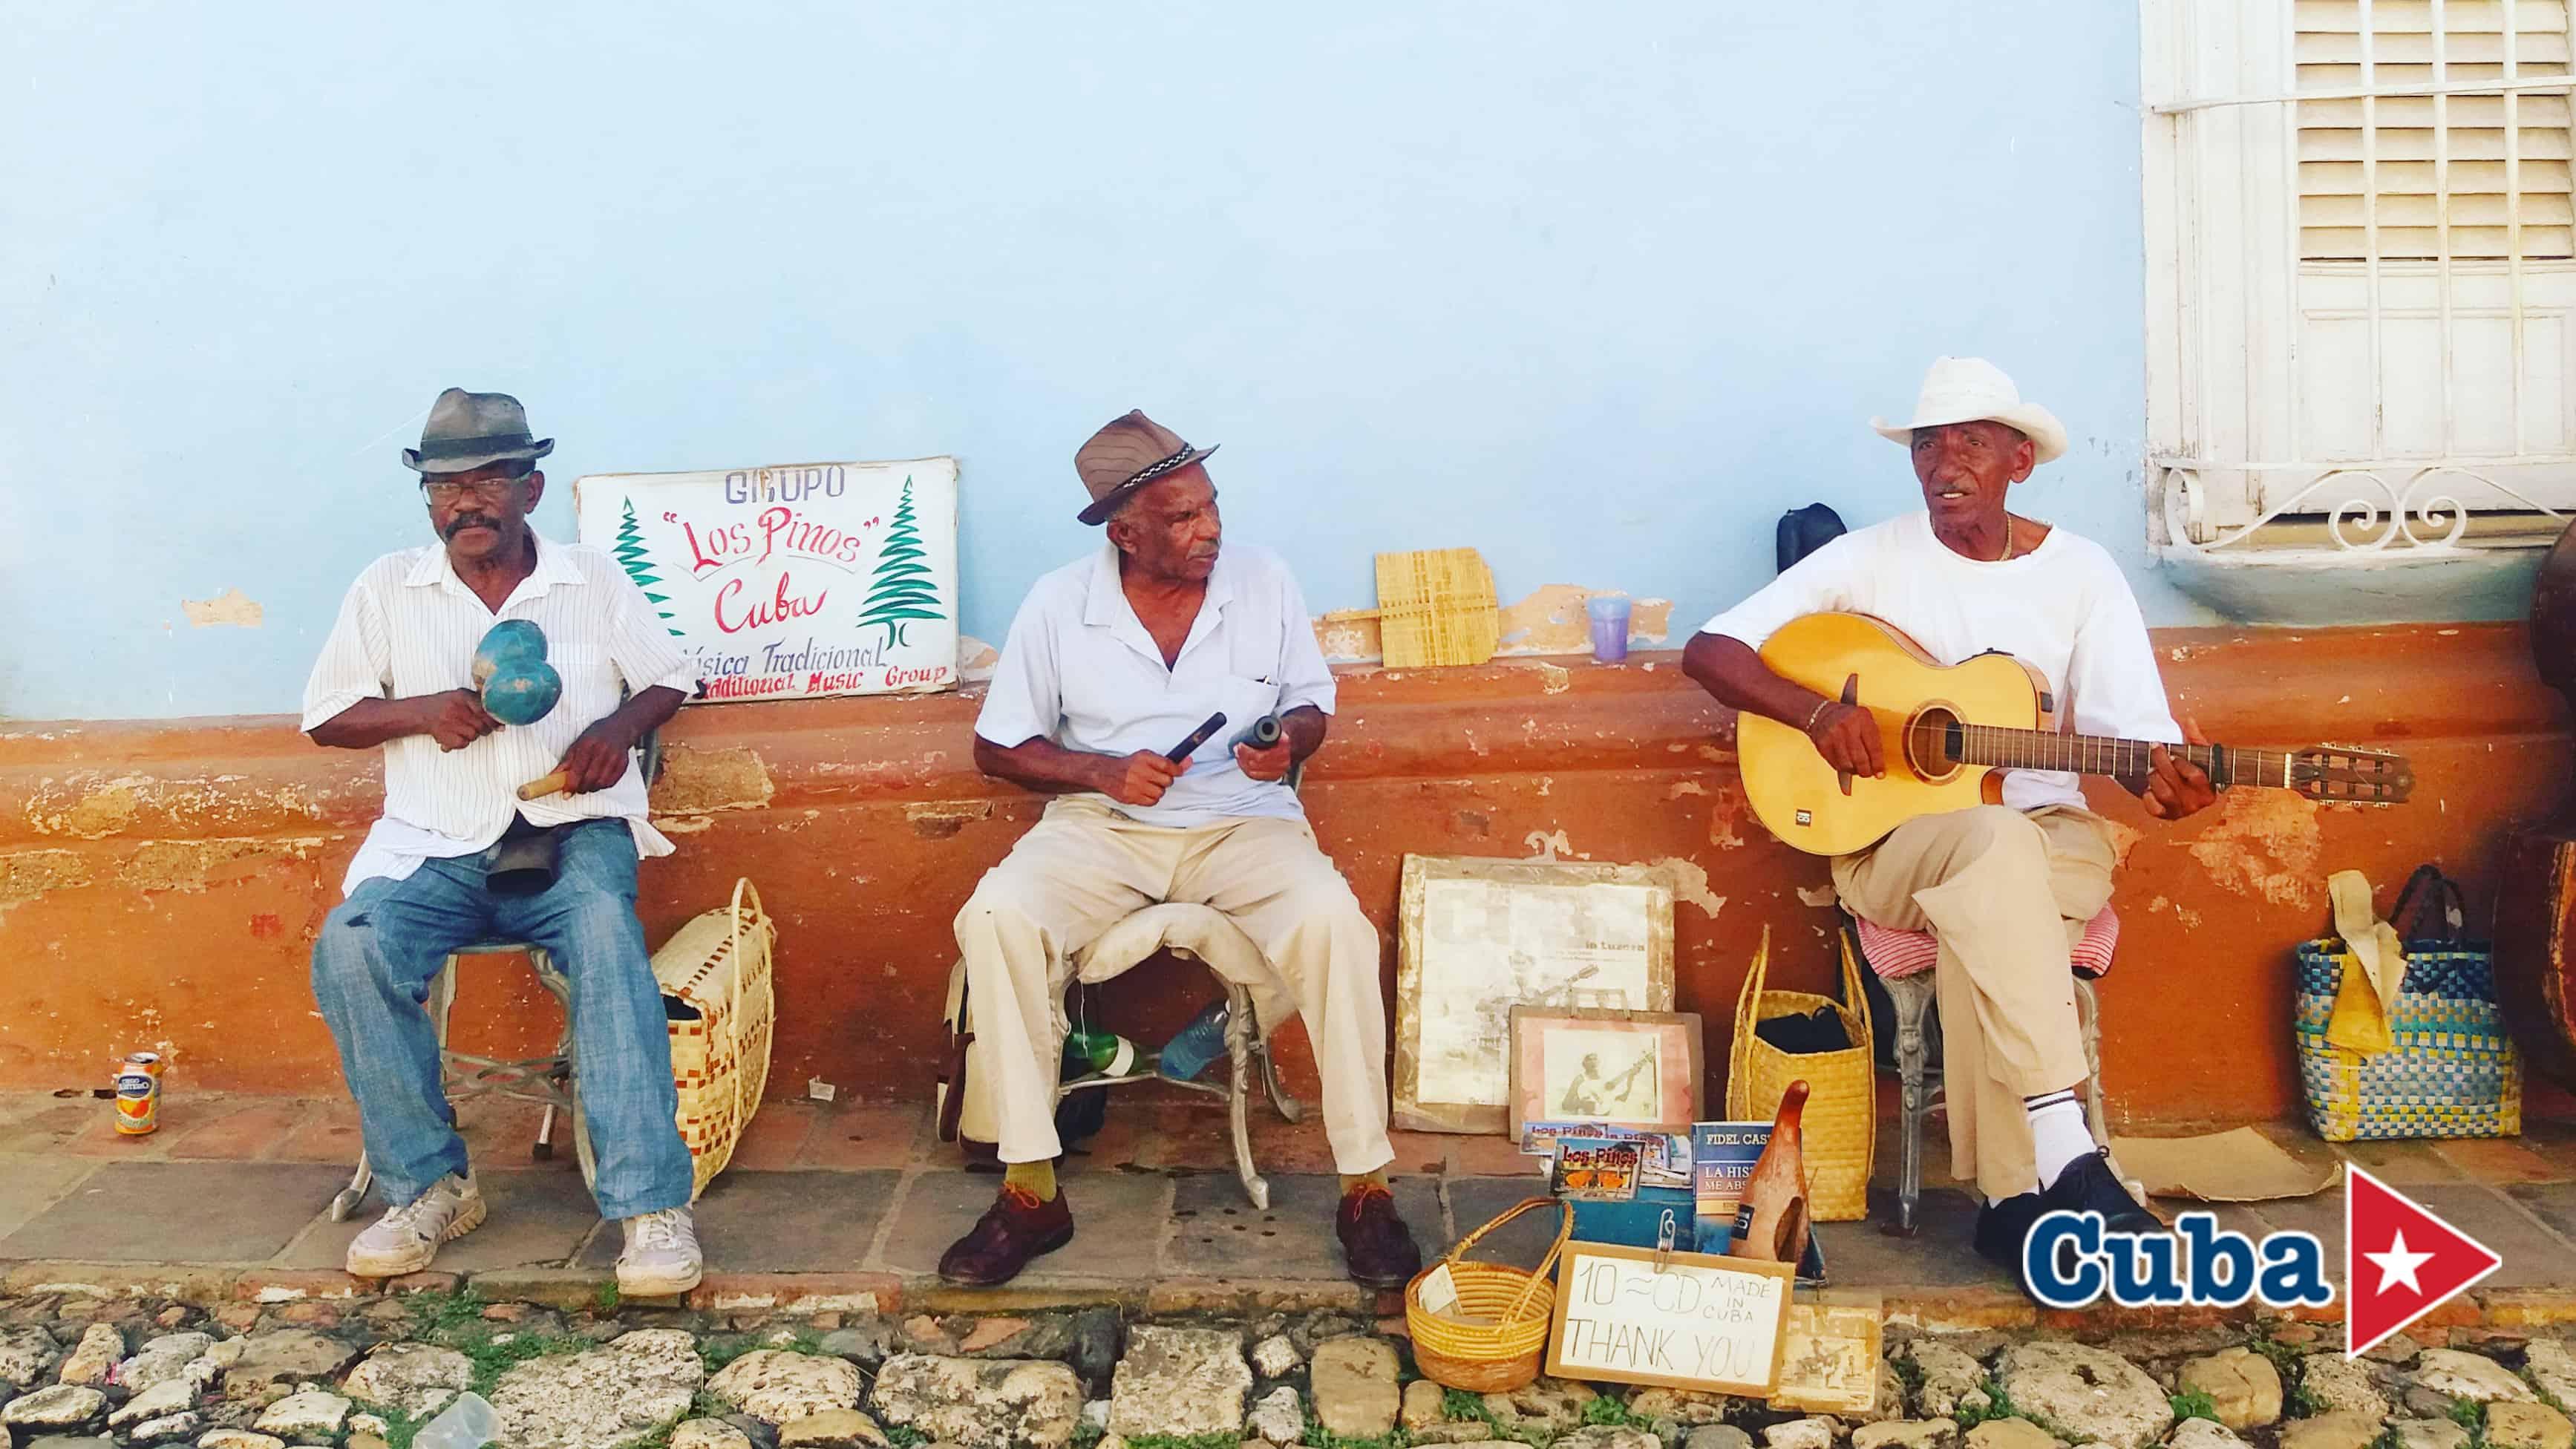 Cuba stories 8